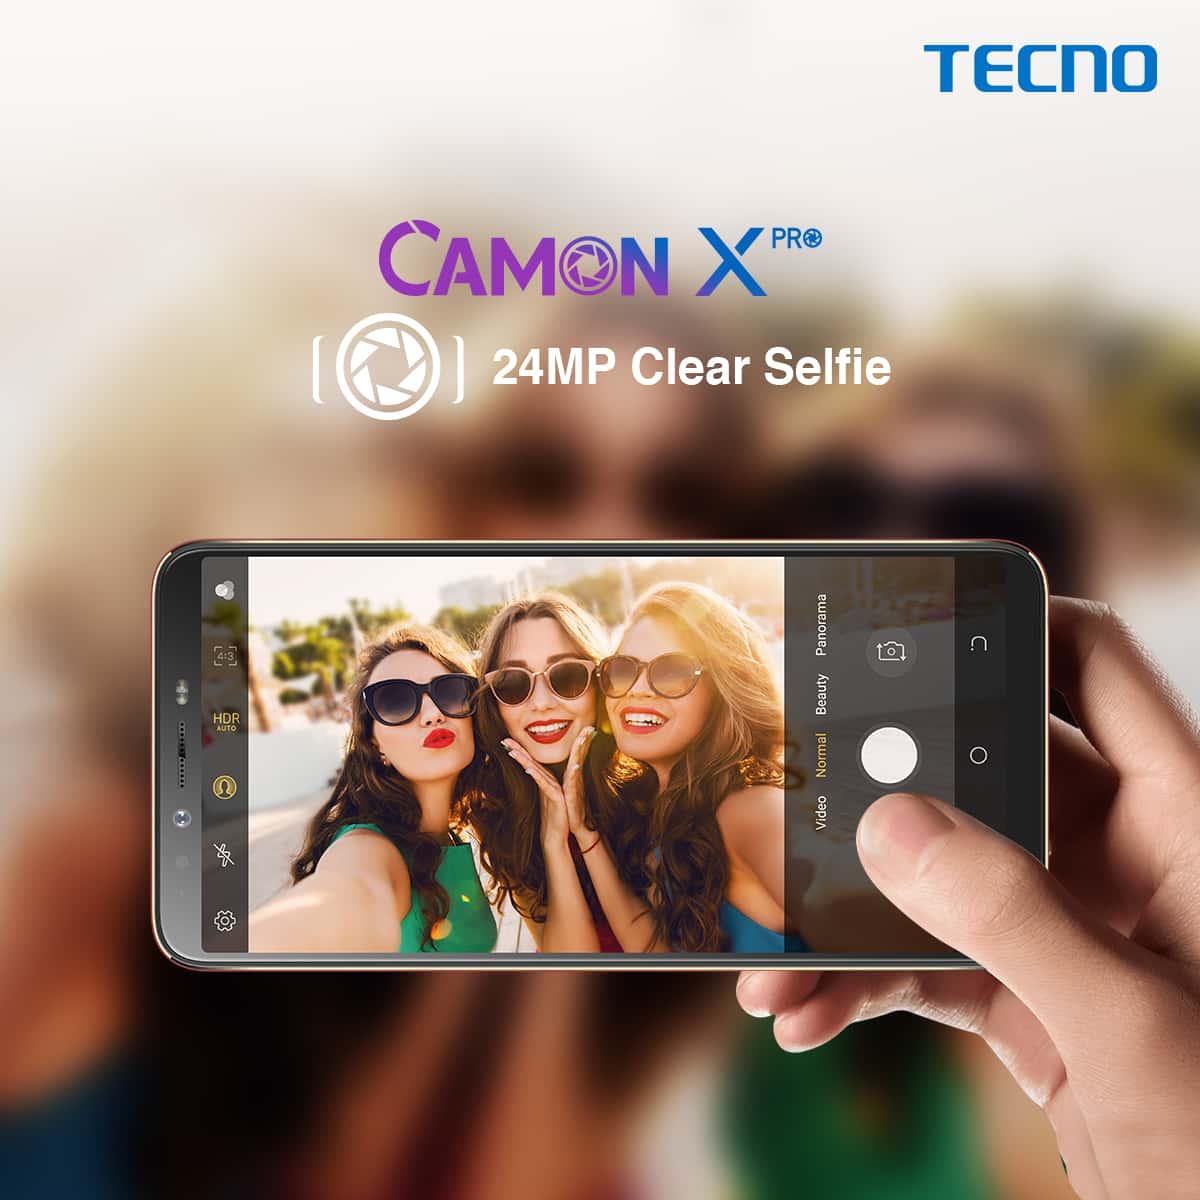 TECNO Camon X Pro 4GB RAM 64GB 4G 24MP Selfie & 16MP Main Camera 3750mAh  Duos